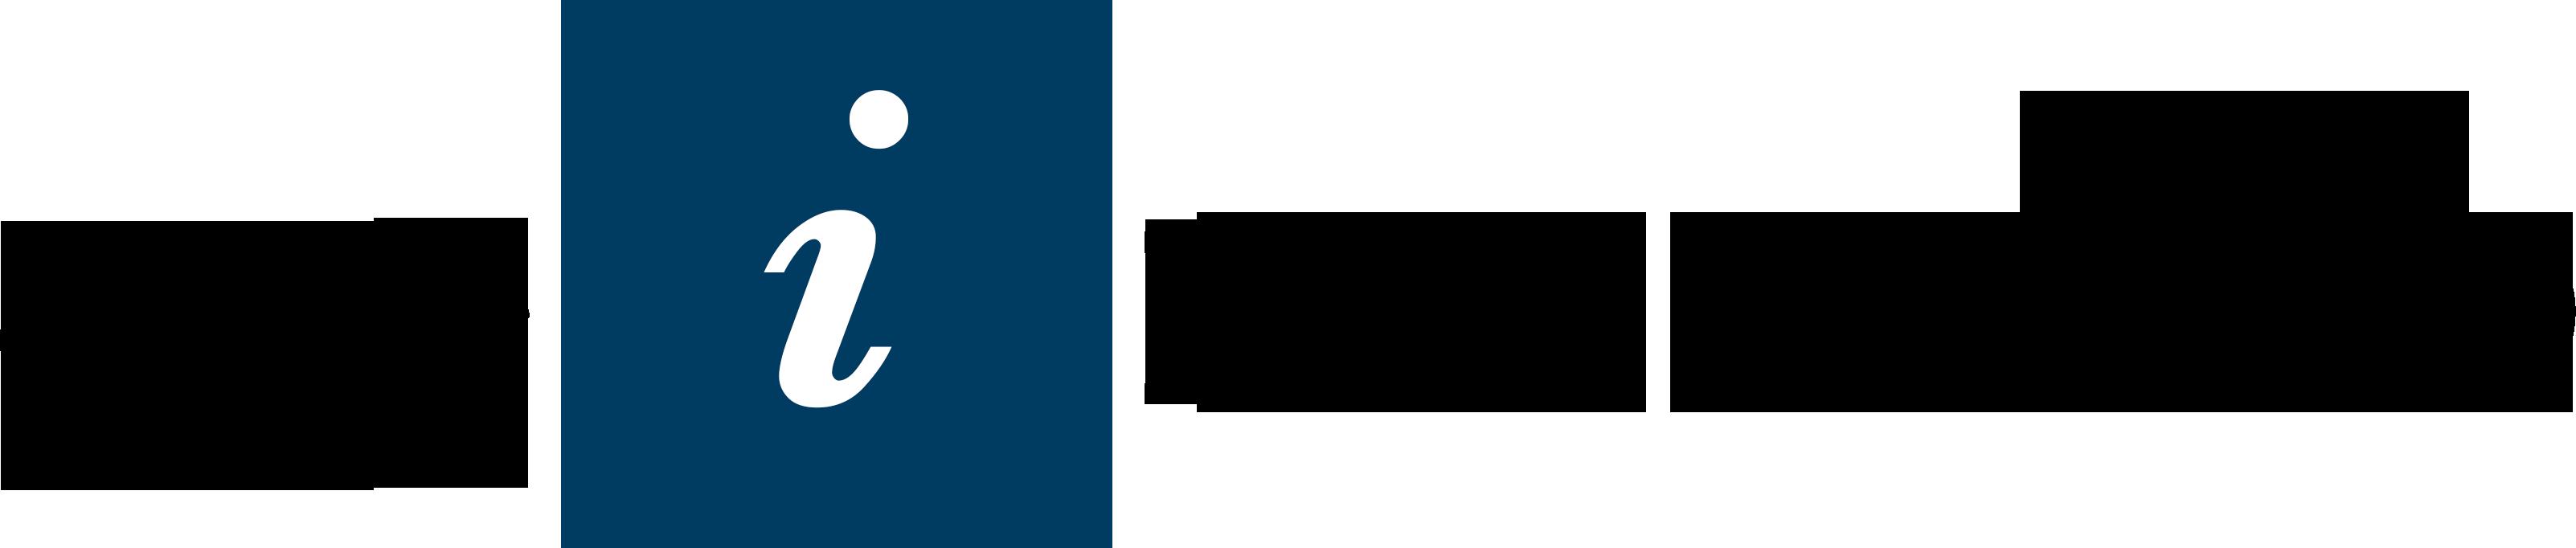 myInvenio logo